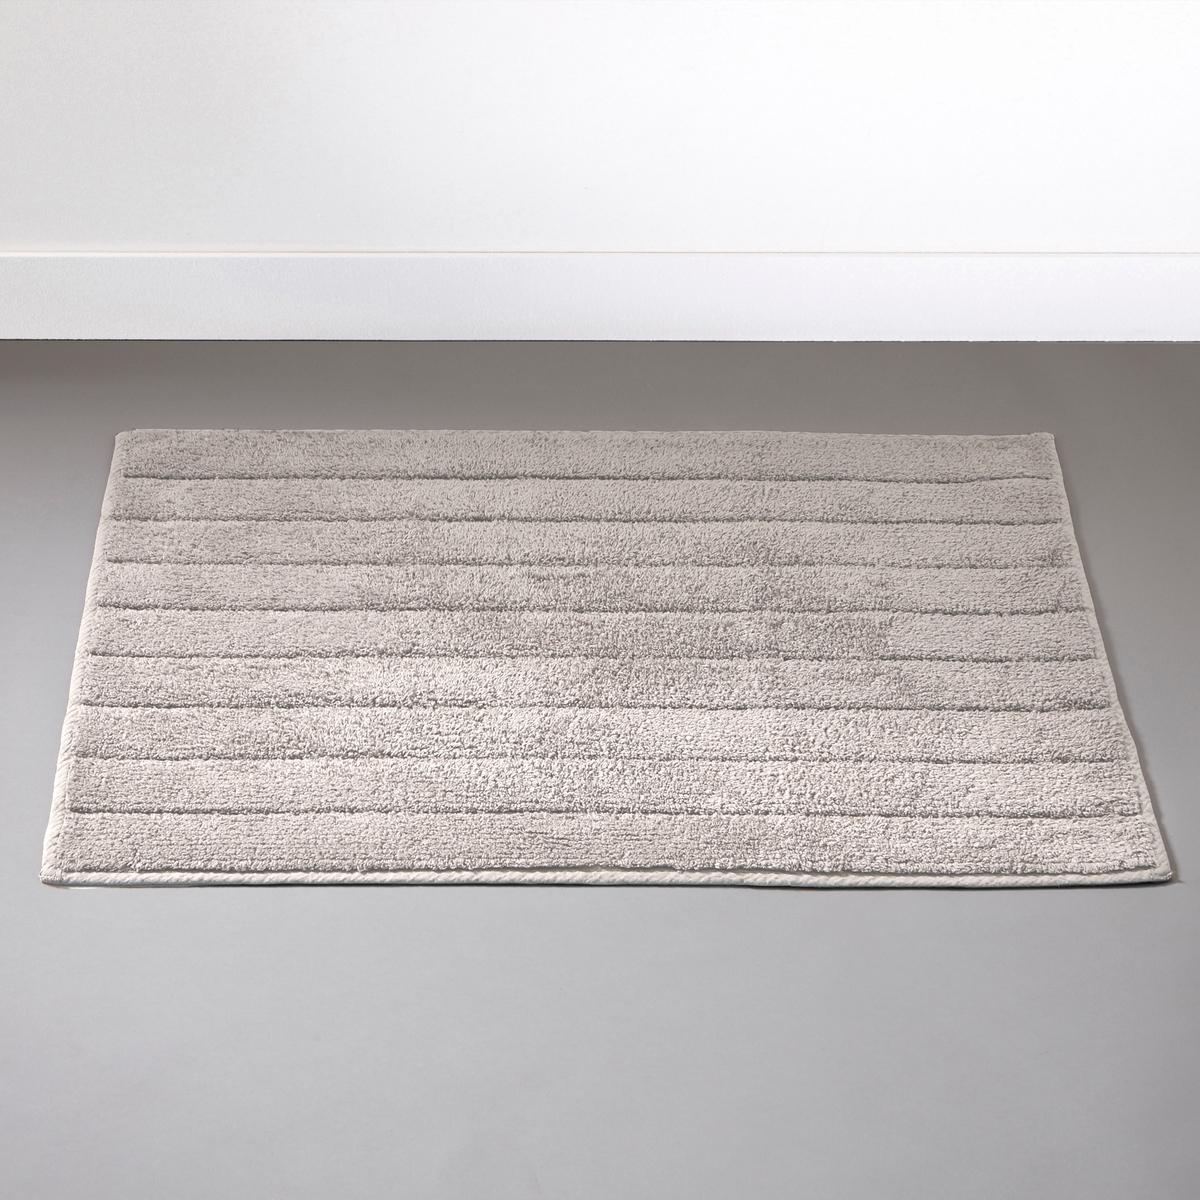 Коврик La Redoute Для ванной гм 50 x 70 см бежевый коврик для ванной доляна собака 3105610 бежевый 50 х 70 см